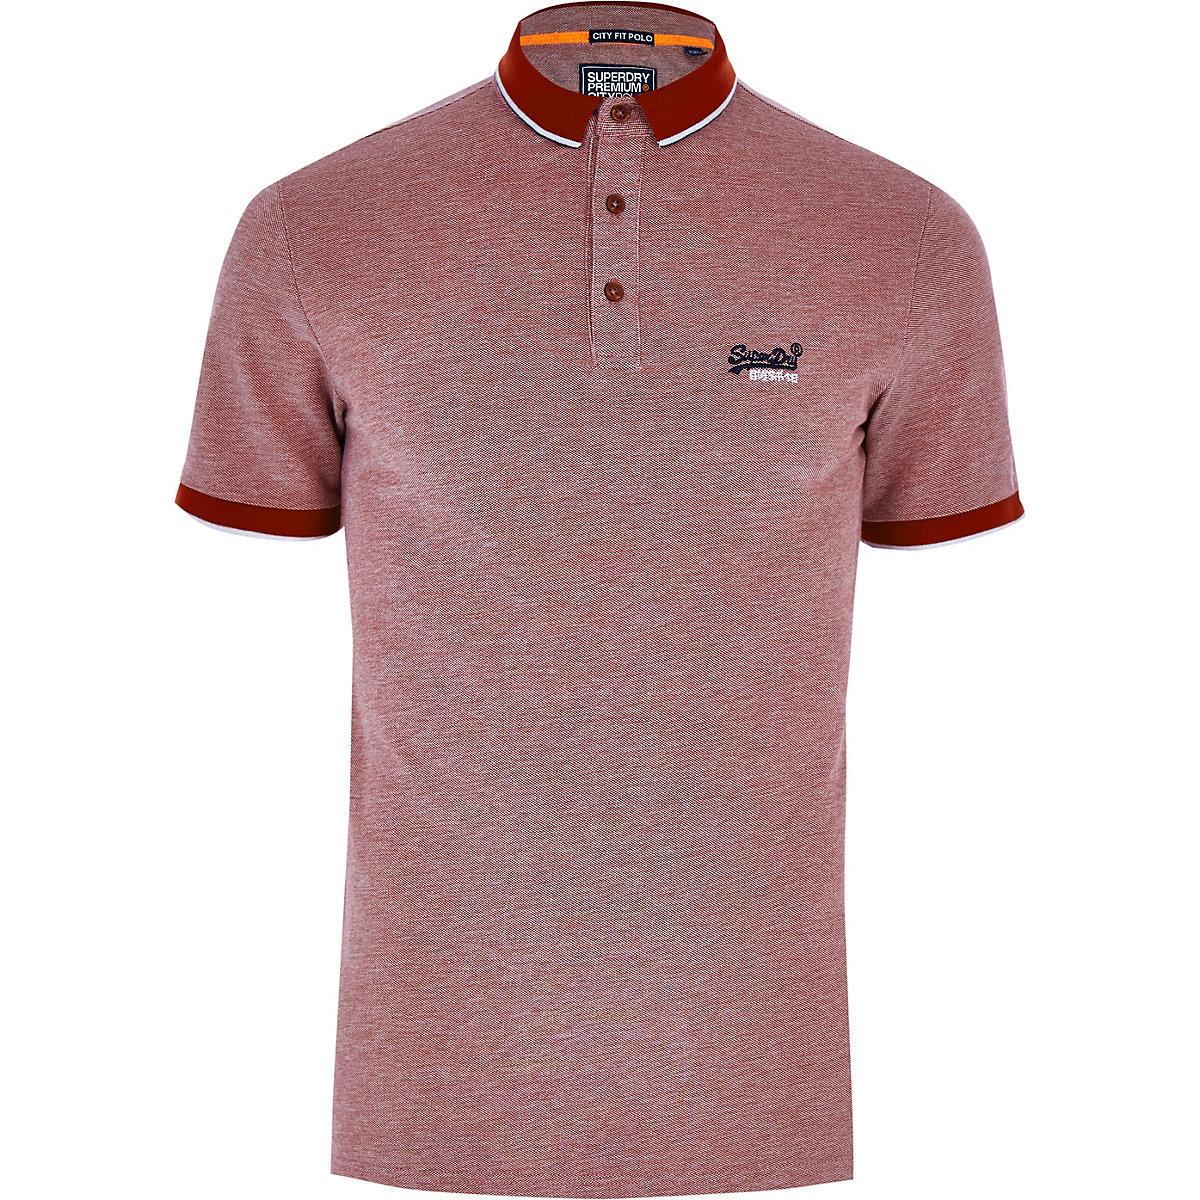 Superdry red logo pique polo shirt